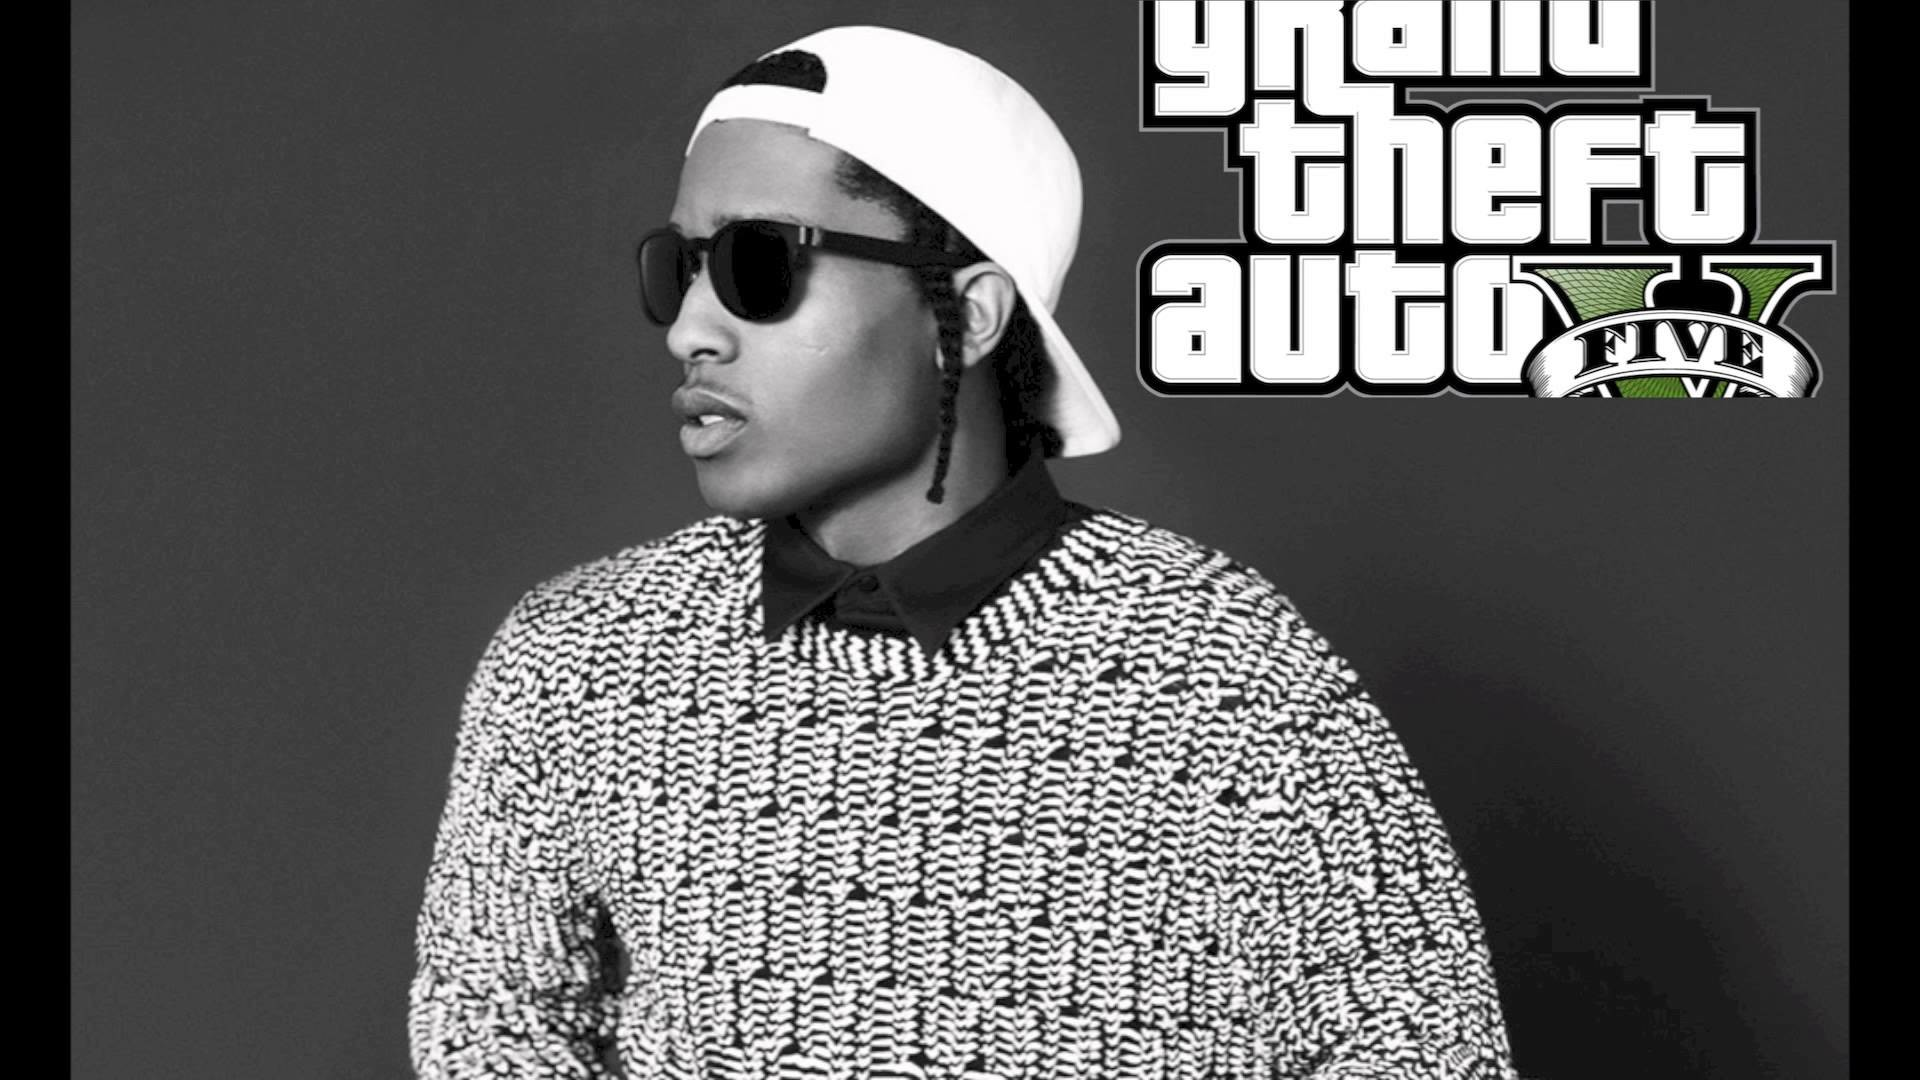 ASAP Rocky GTA 5 Wallpaper • Rap Wallpapers